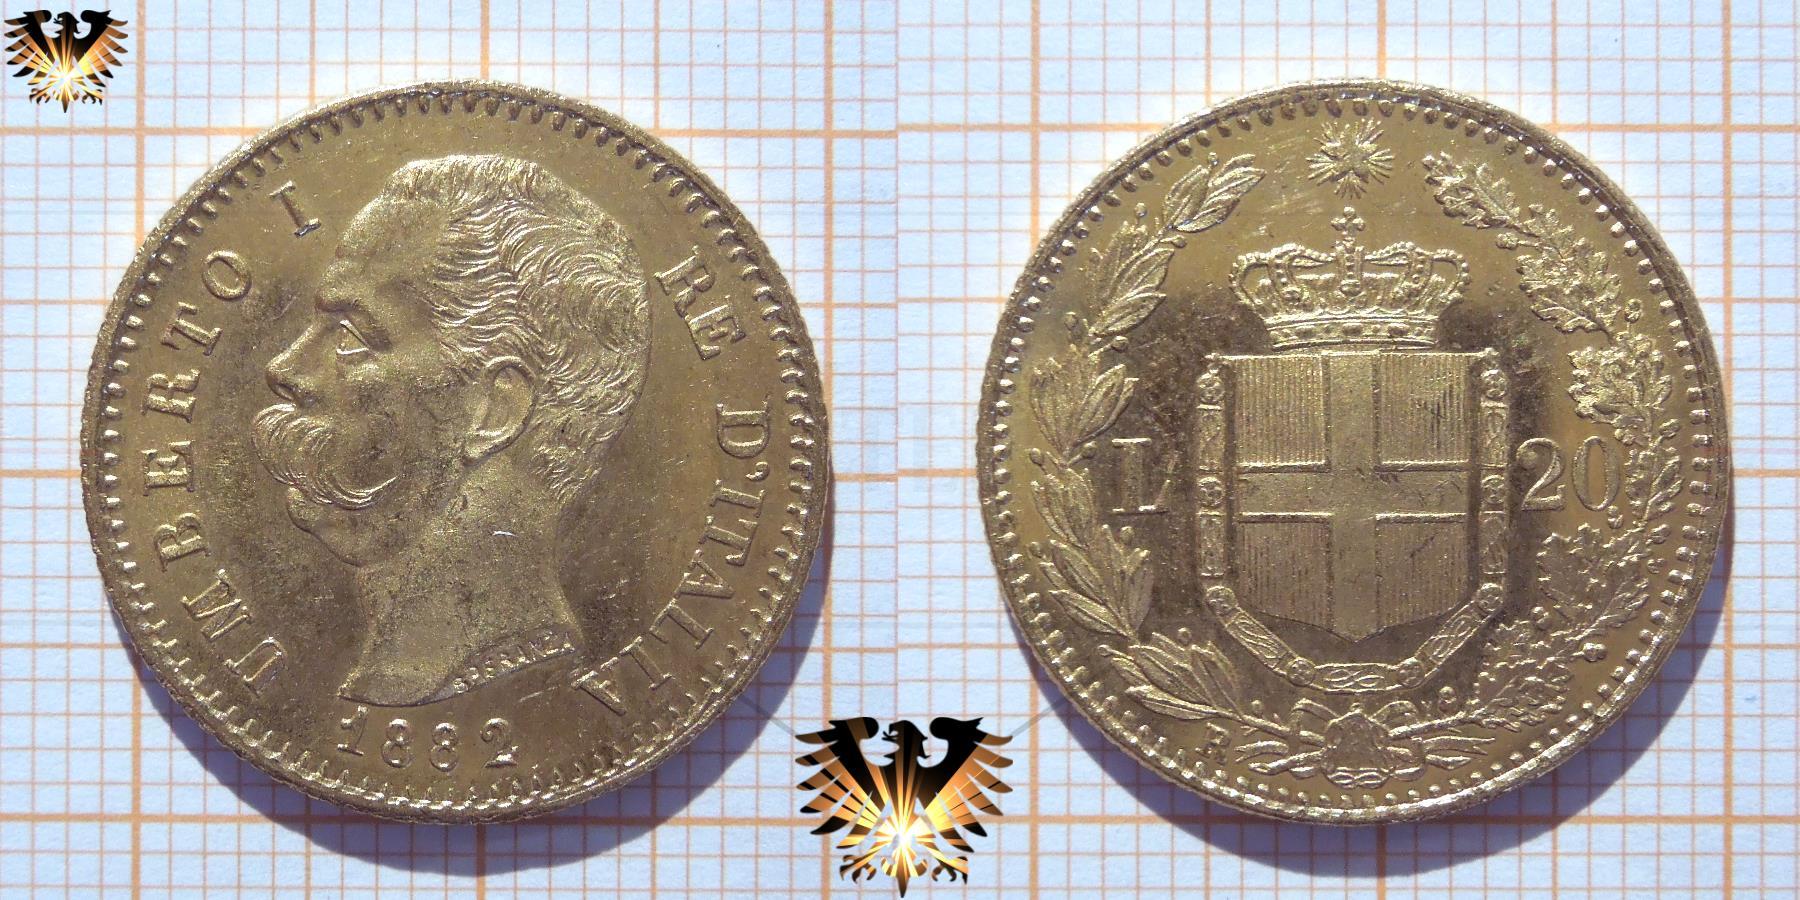 Italien 20 L Lire Von 1882 Gold Umberto I Re Ditalia Münze